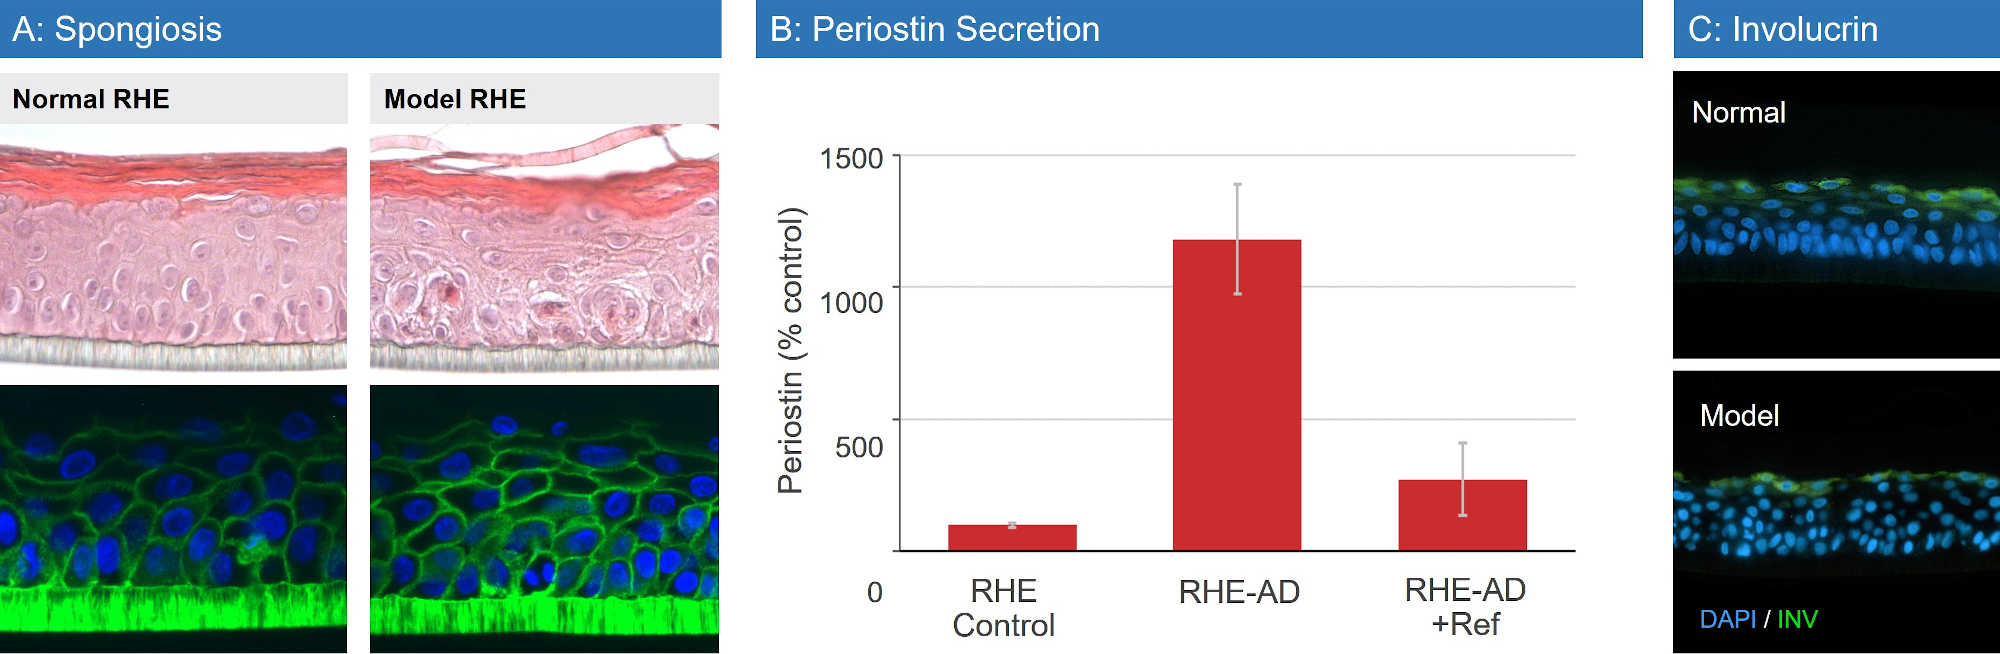 Atopic Dermatitis RHE Data